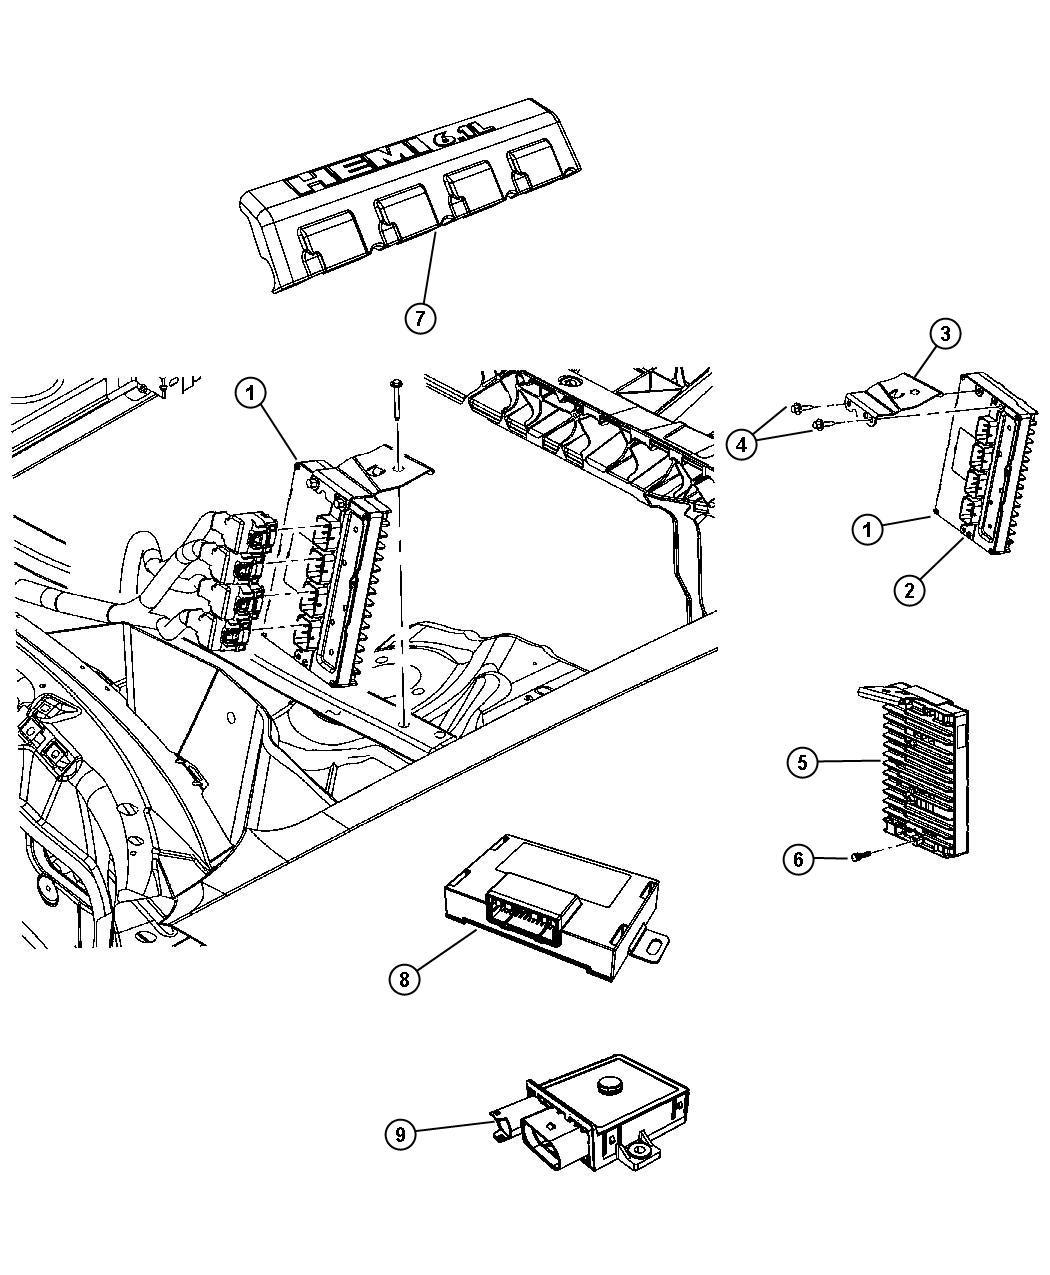 Dodge Sprinter Module Glow Plug Plugs Engine